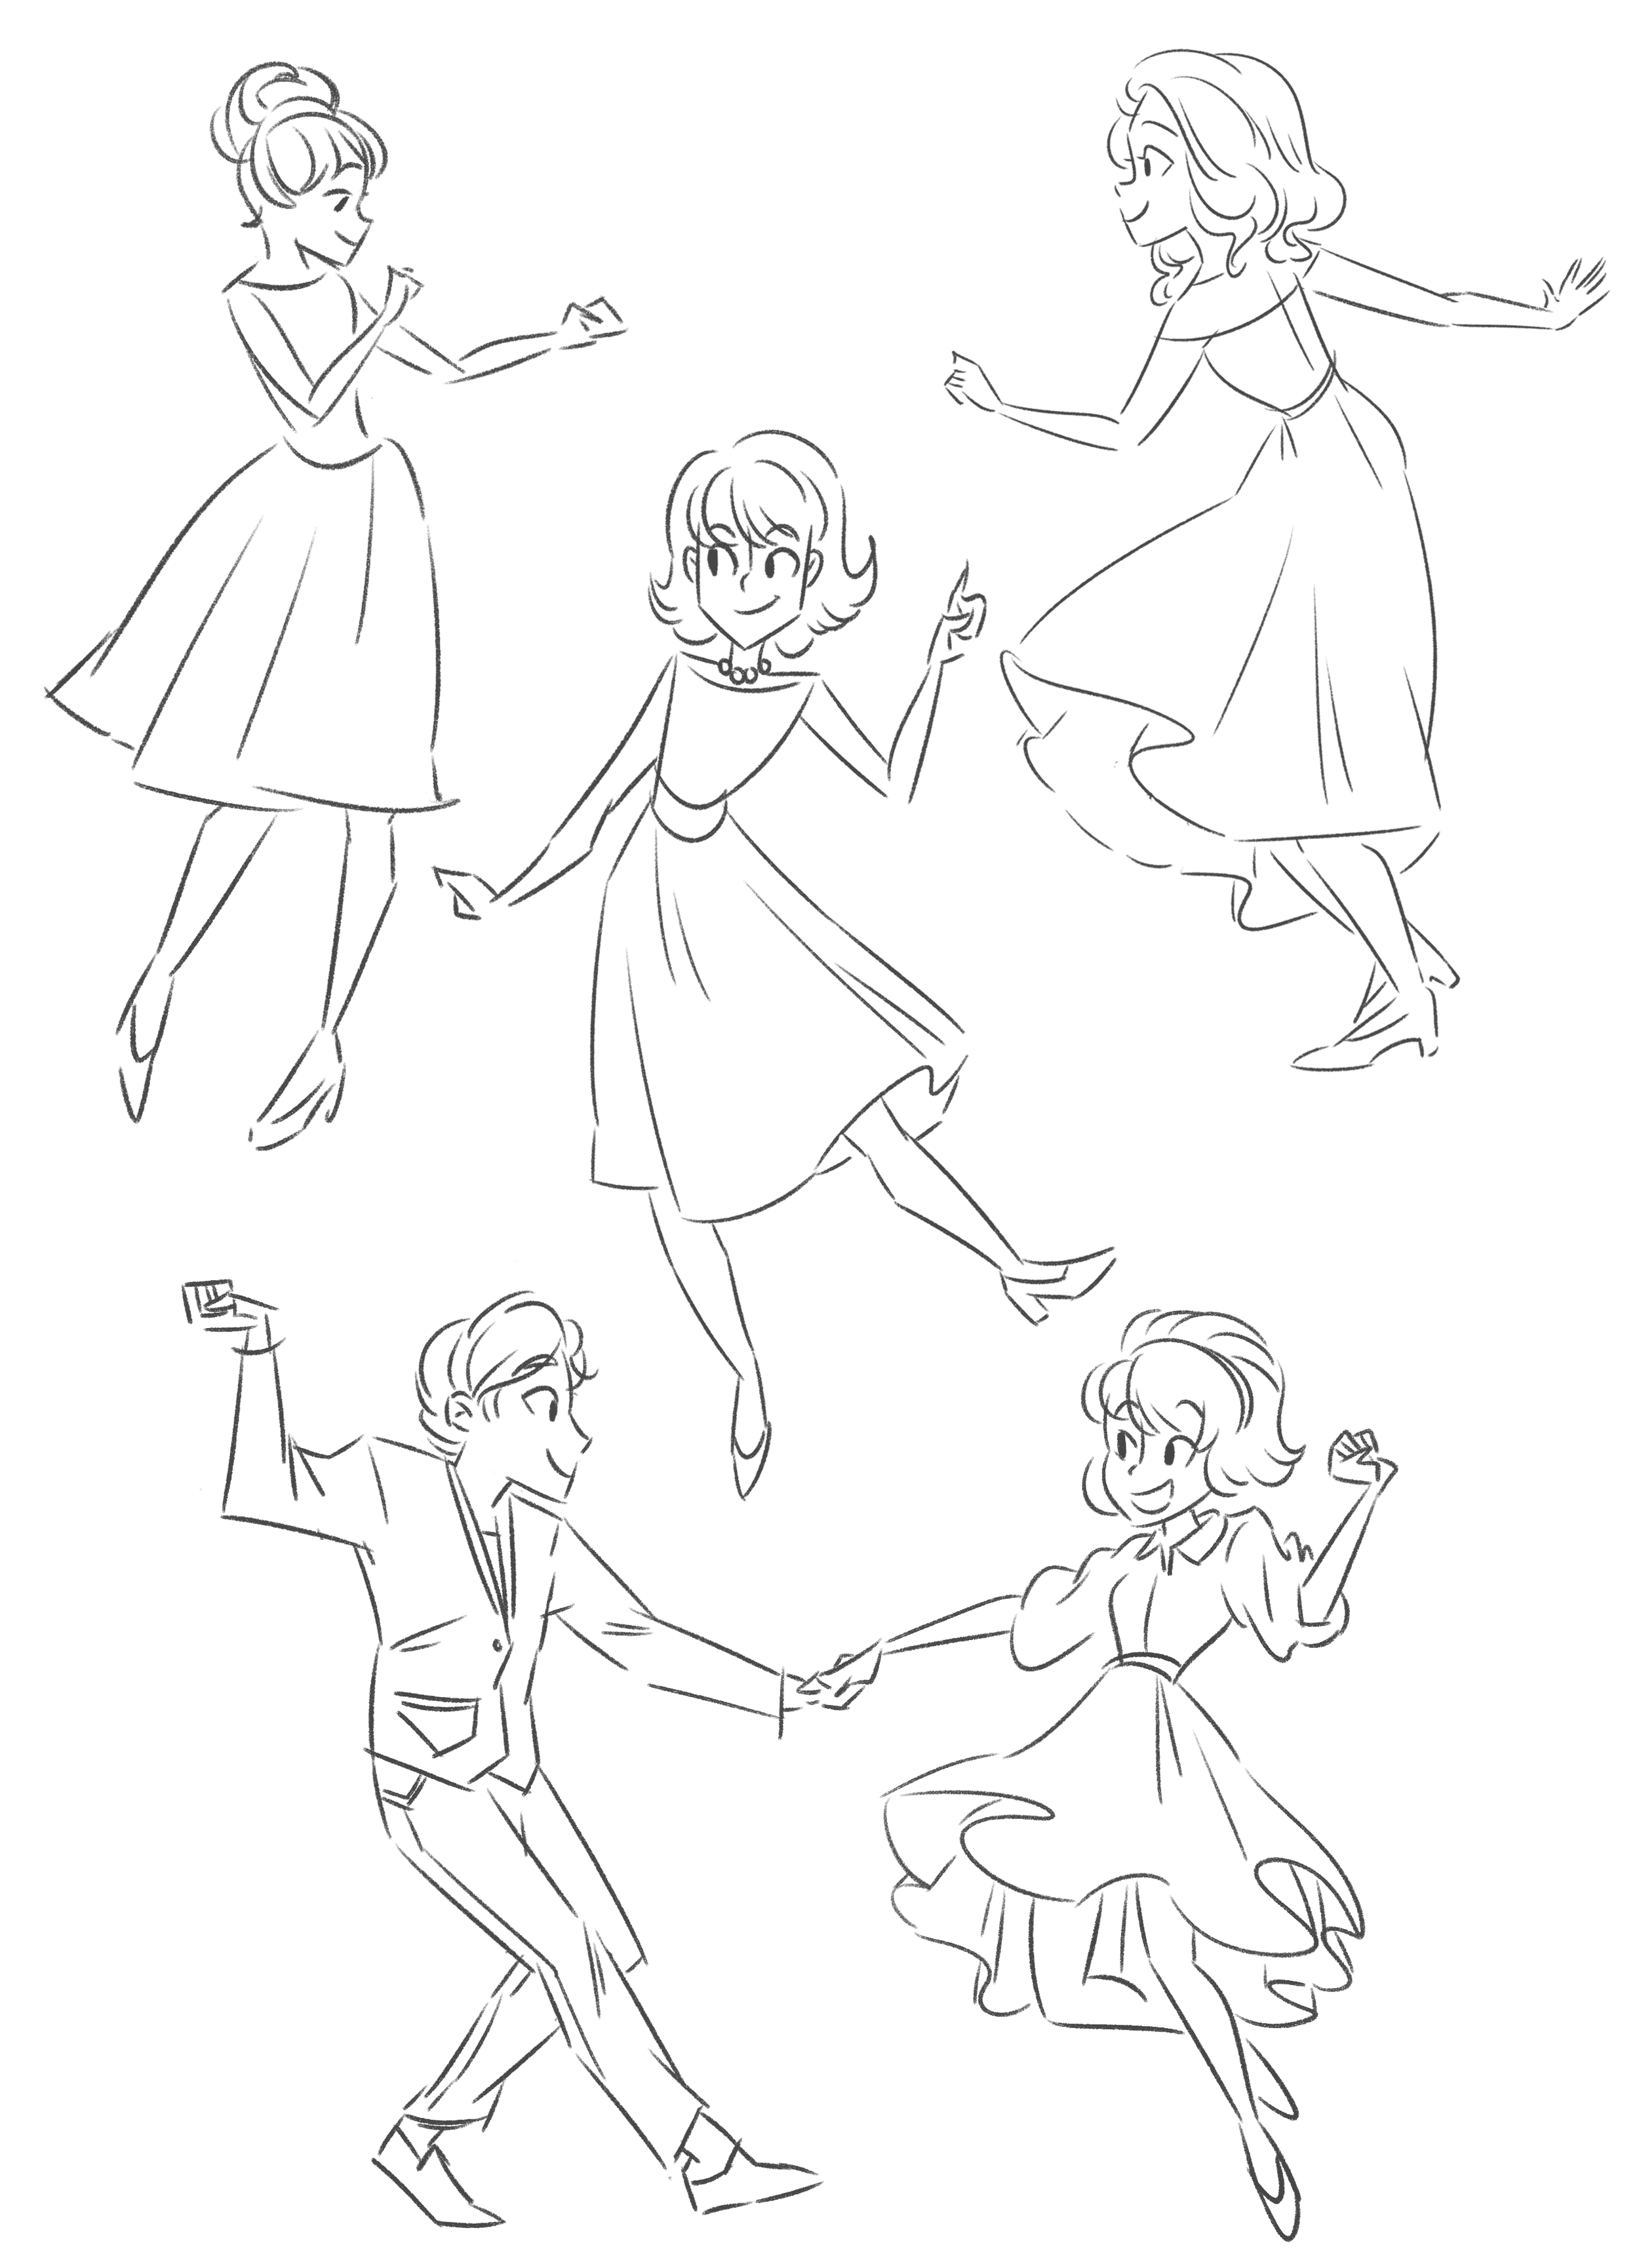 60s dance.png